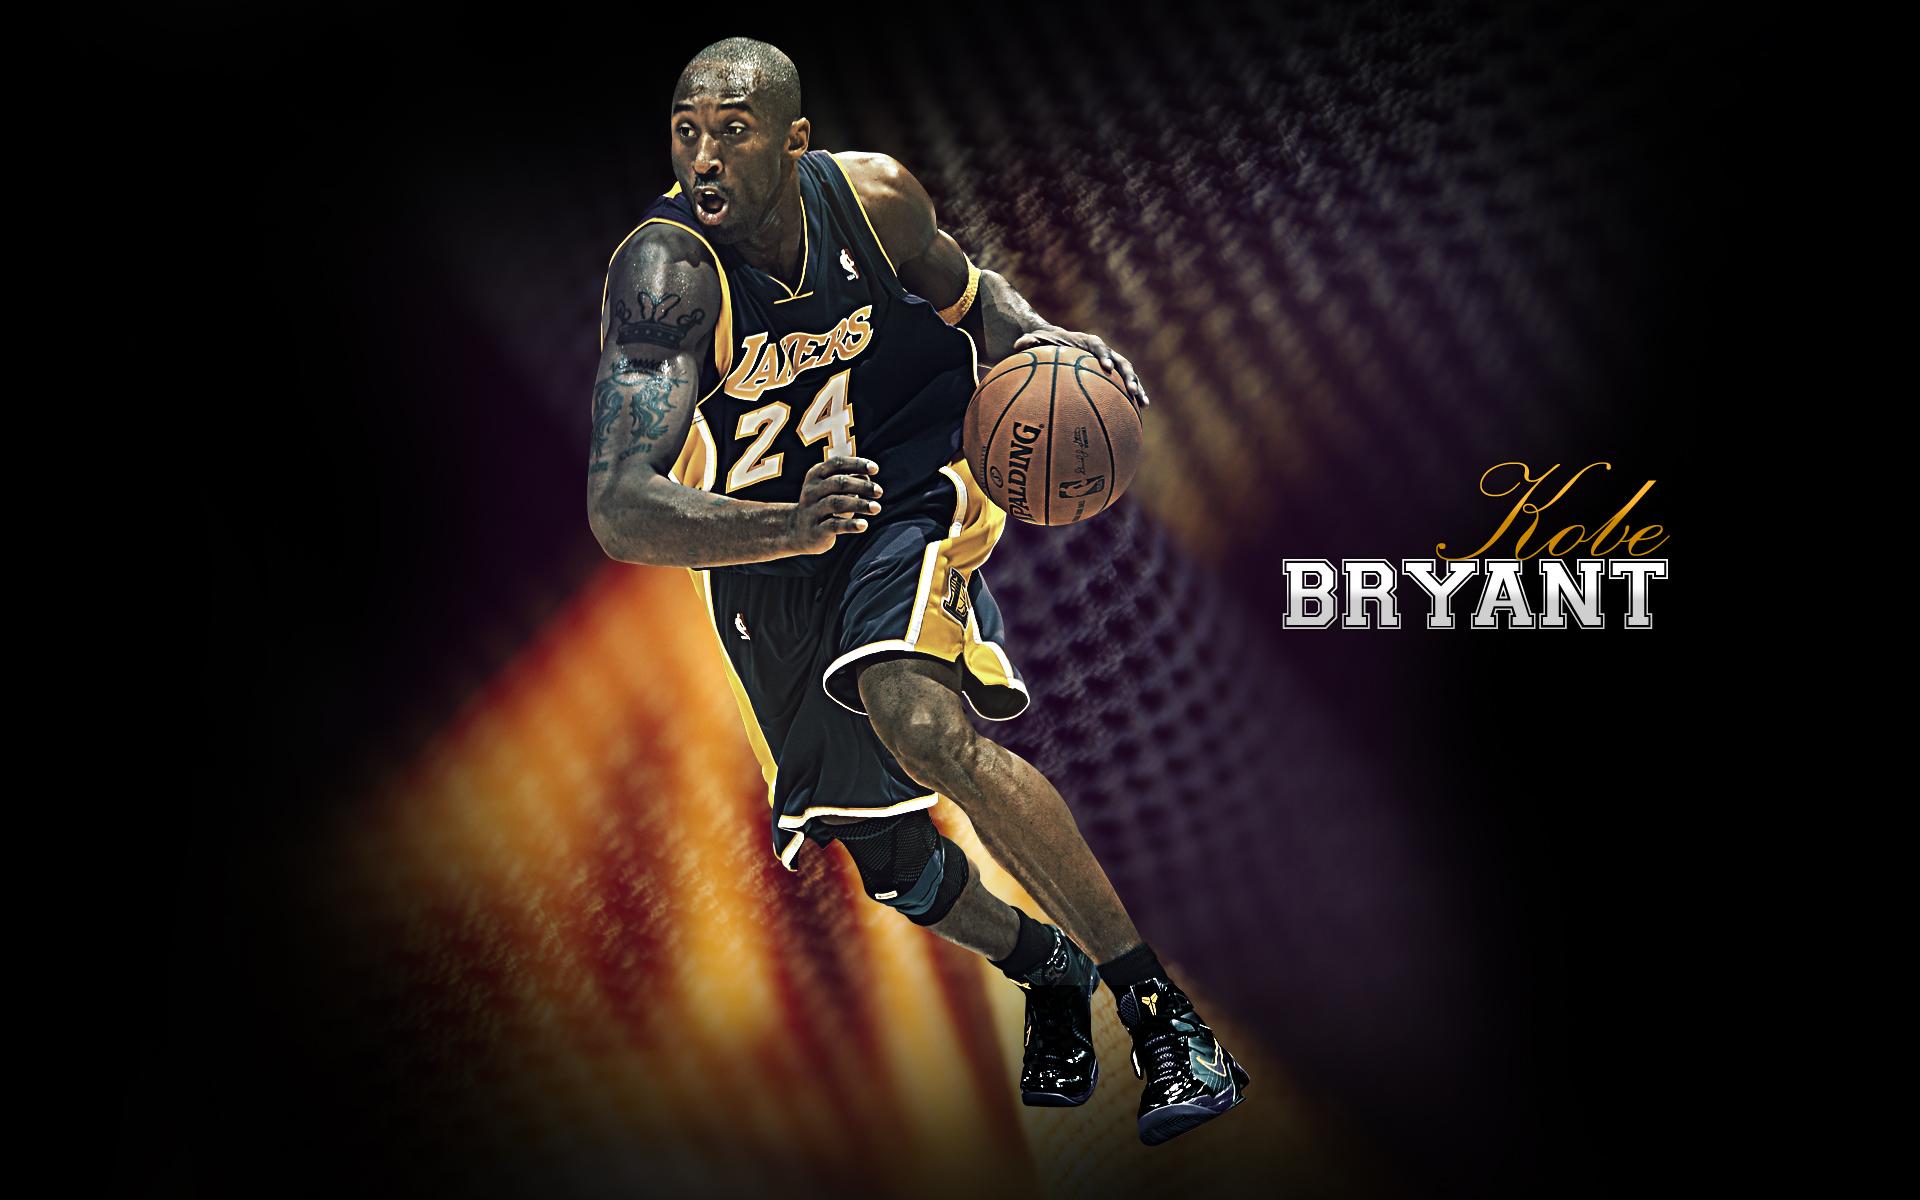 Kobe Bryant wallpaper 10349 1920x1200